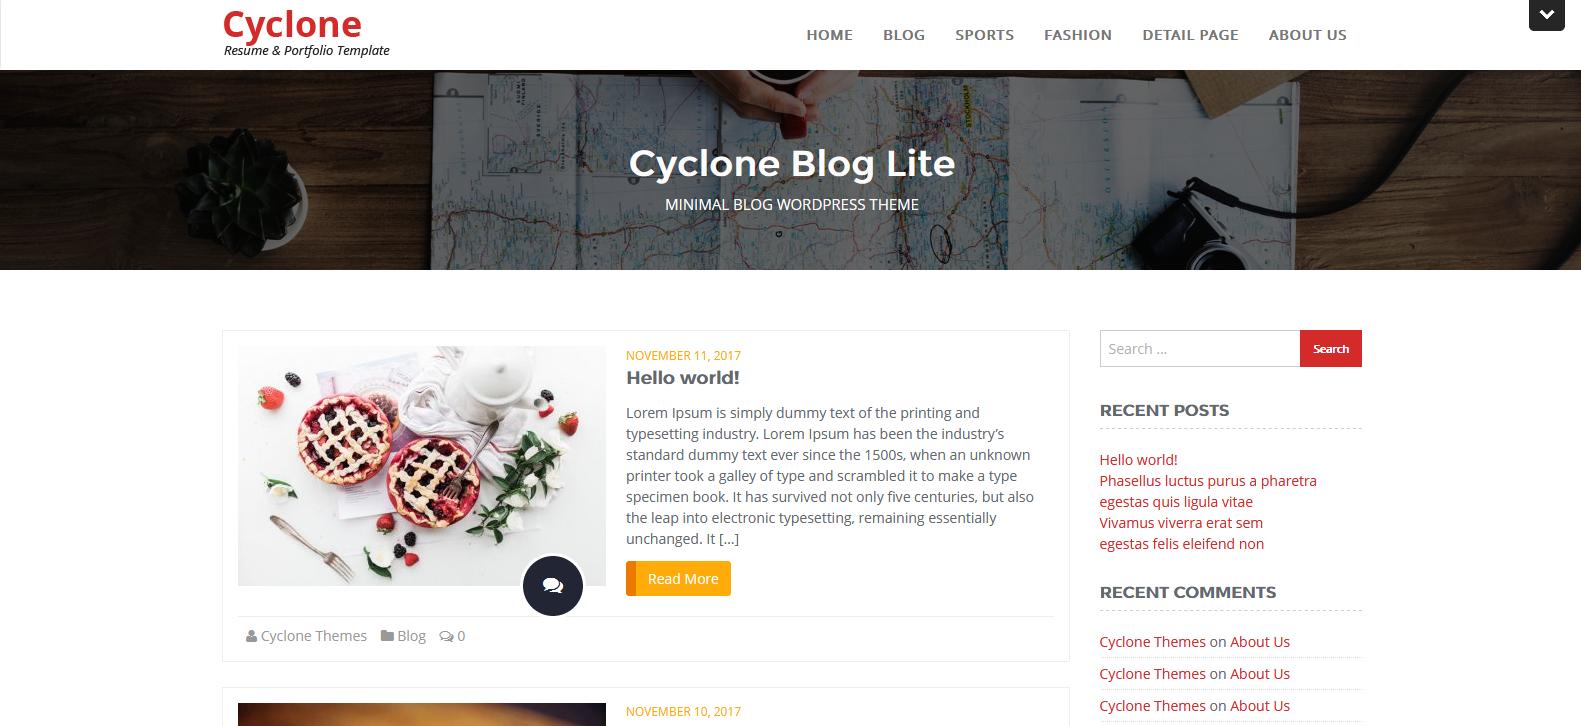 Демо-сайт с темой Cyclone Blog